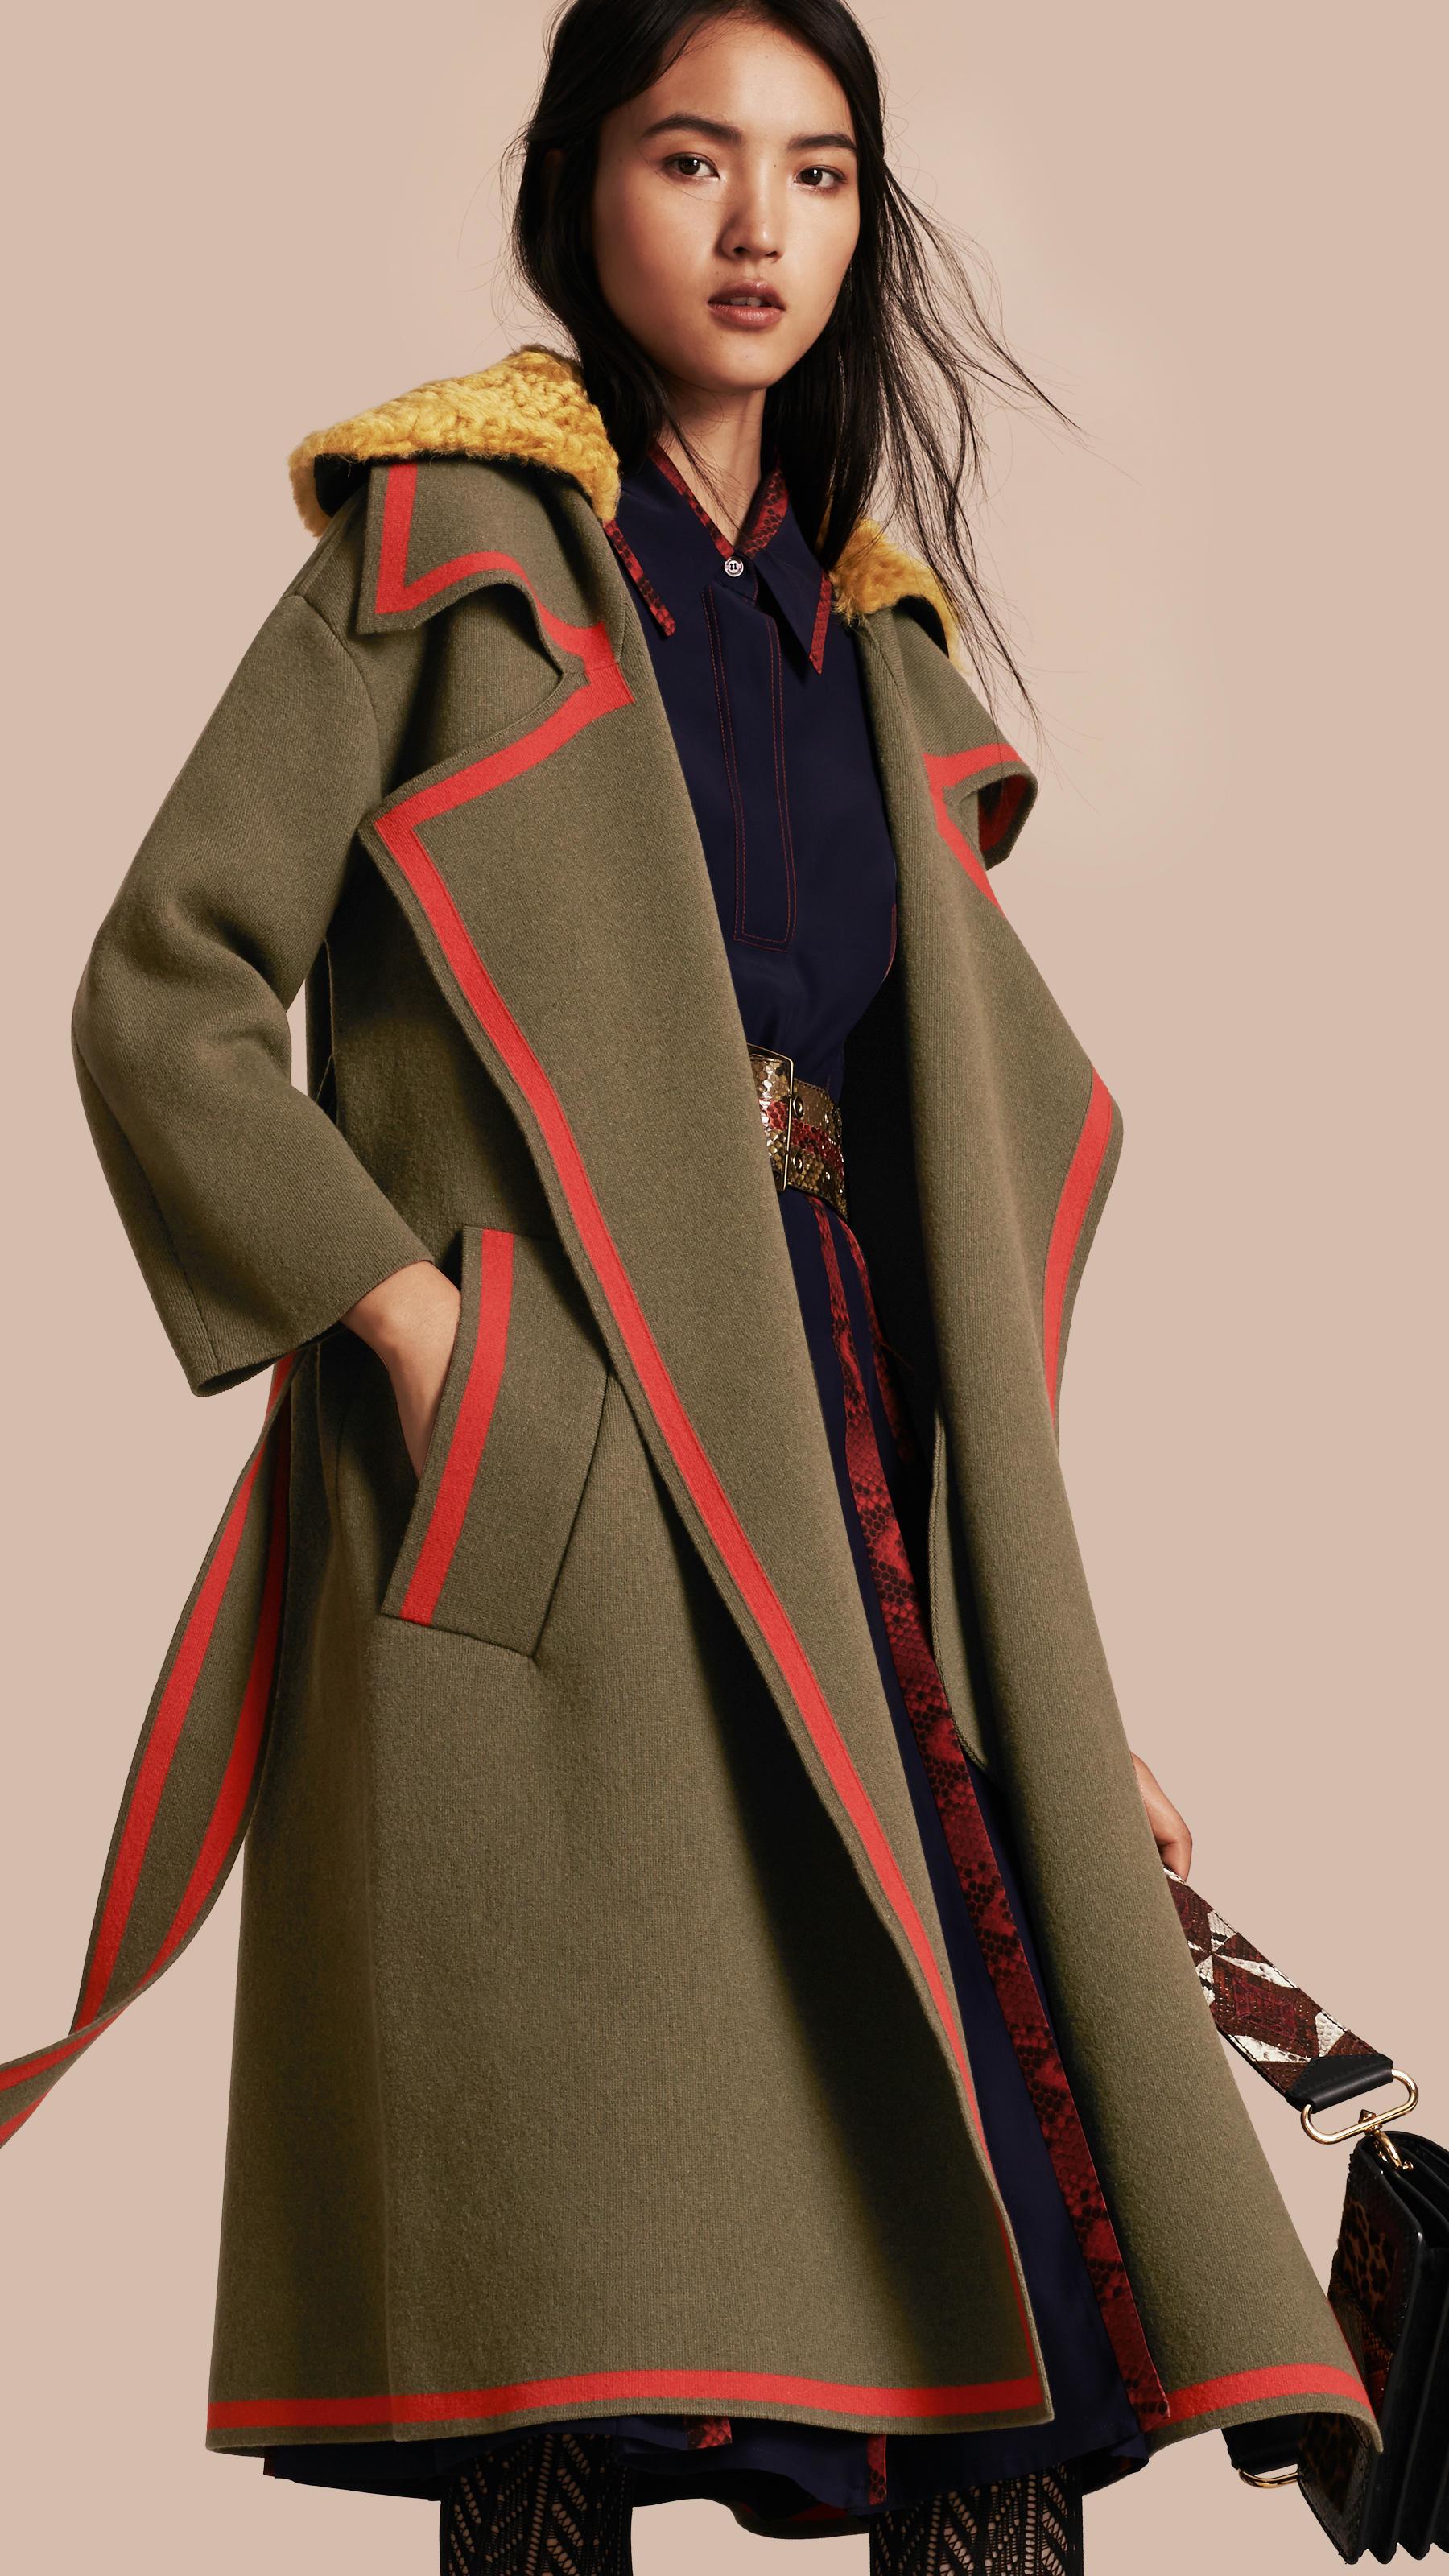 Burberry Wool Cashmere Knit Cardigan Coat 43